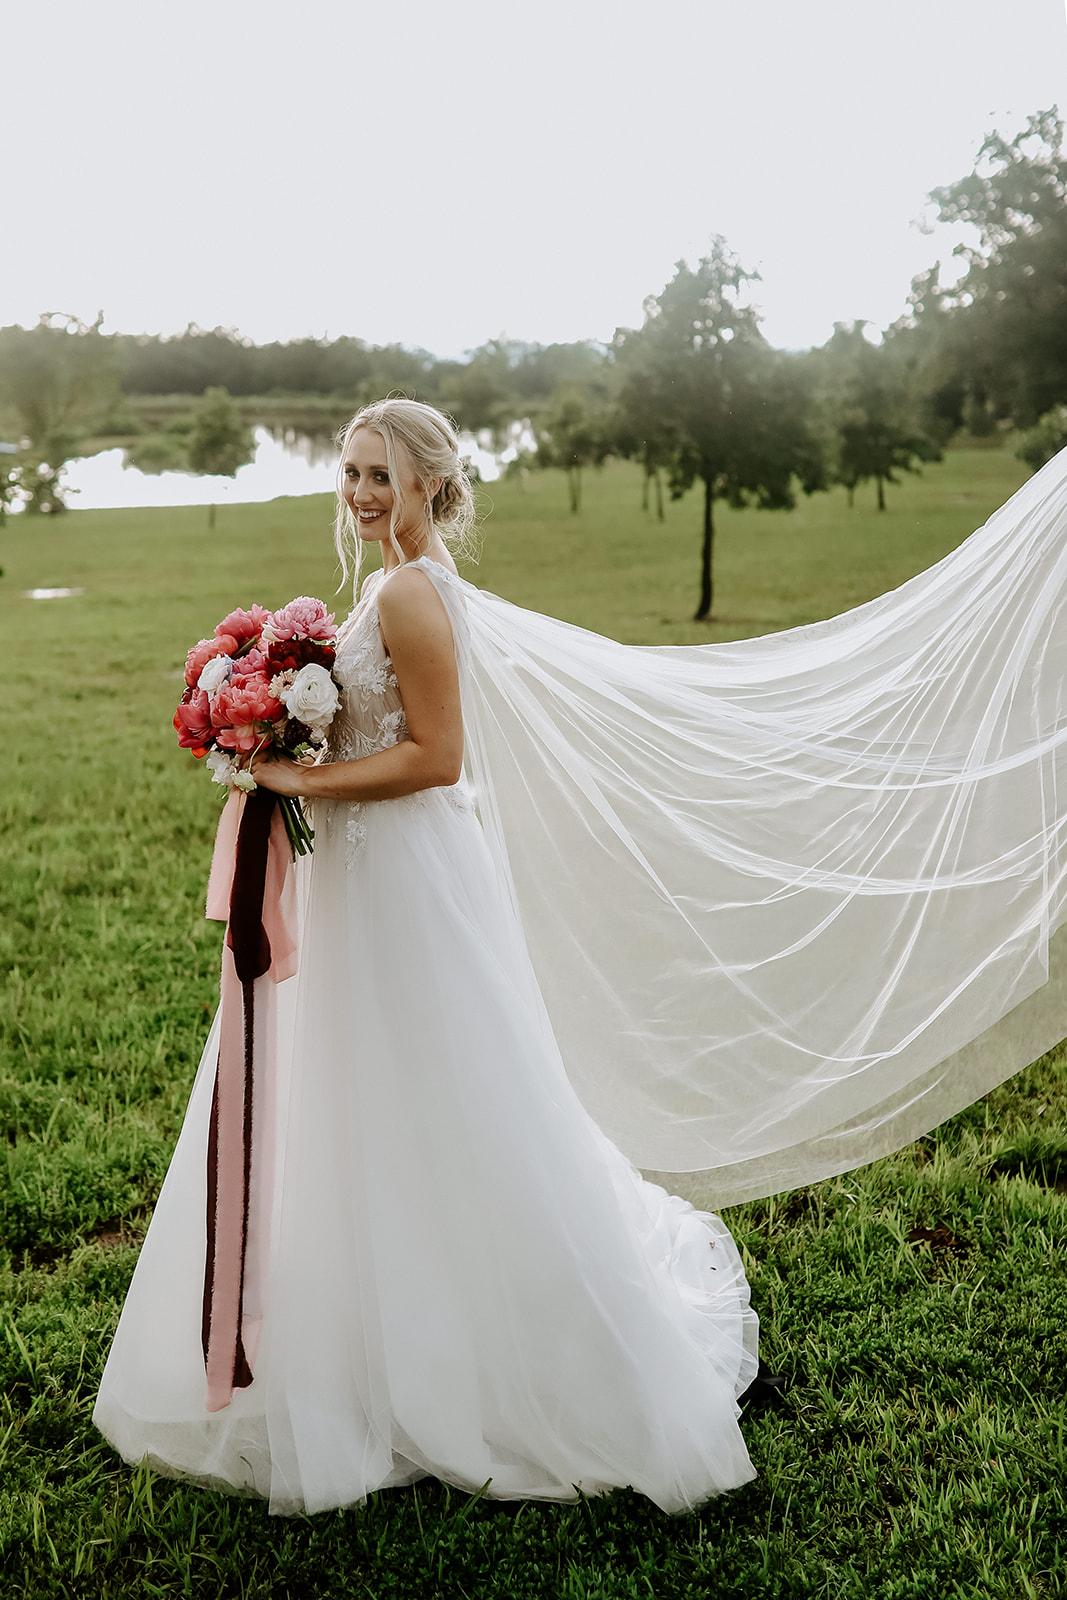 Oklahoma Outdoor Wedding Tulsa White Barn Venue 82.jpg